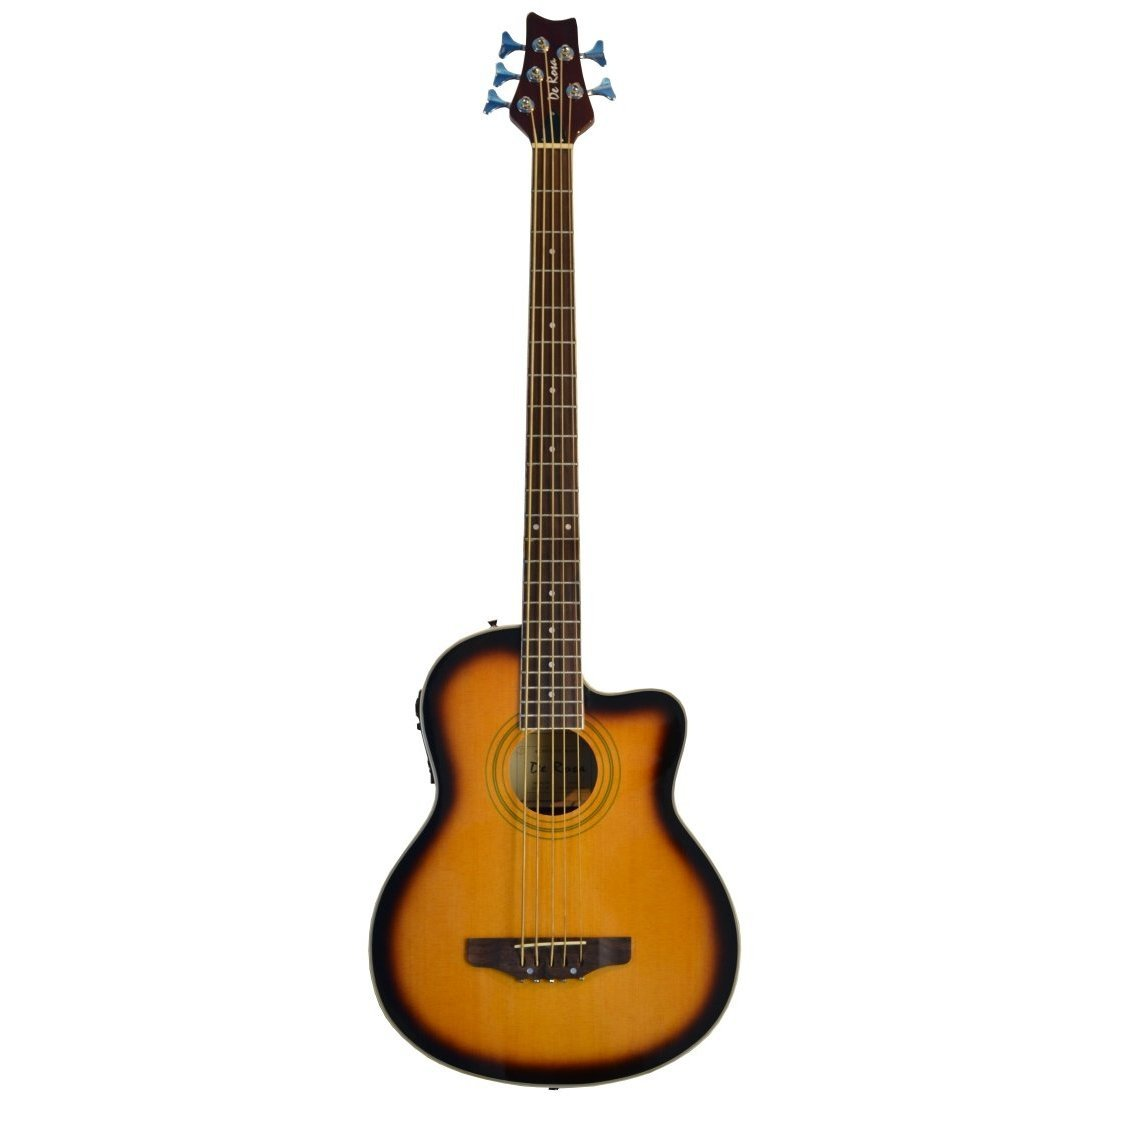 5 String Cutaway Tobacco Sunburst Acoustic Electric Bass with 4 EQ - & DirectlyCheap(TM) Translucent Blue Medium Guitar Pick